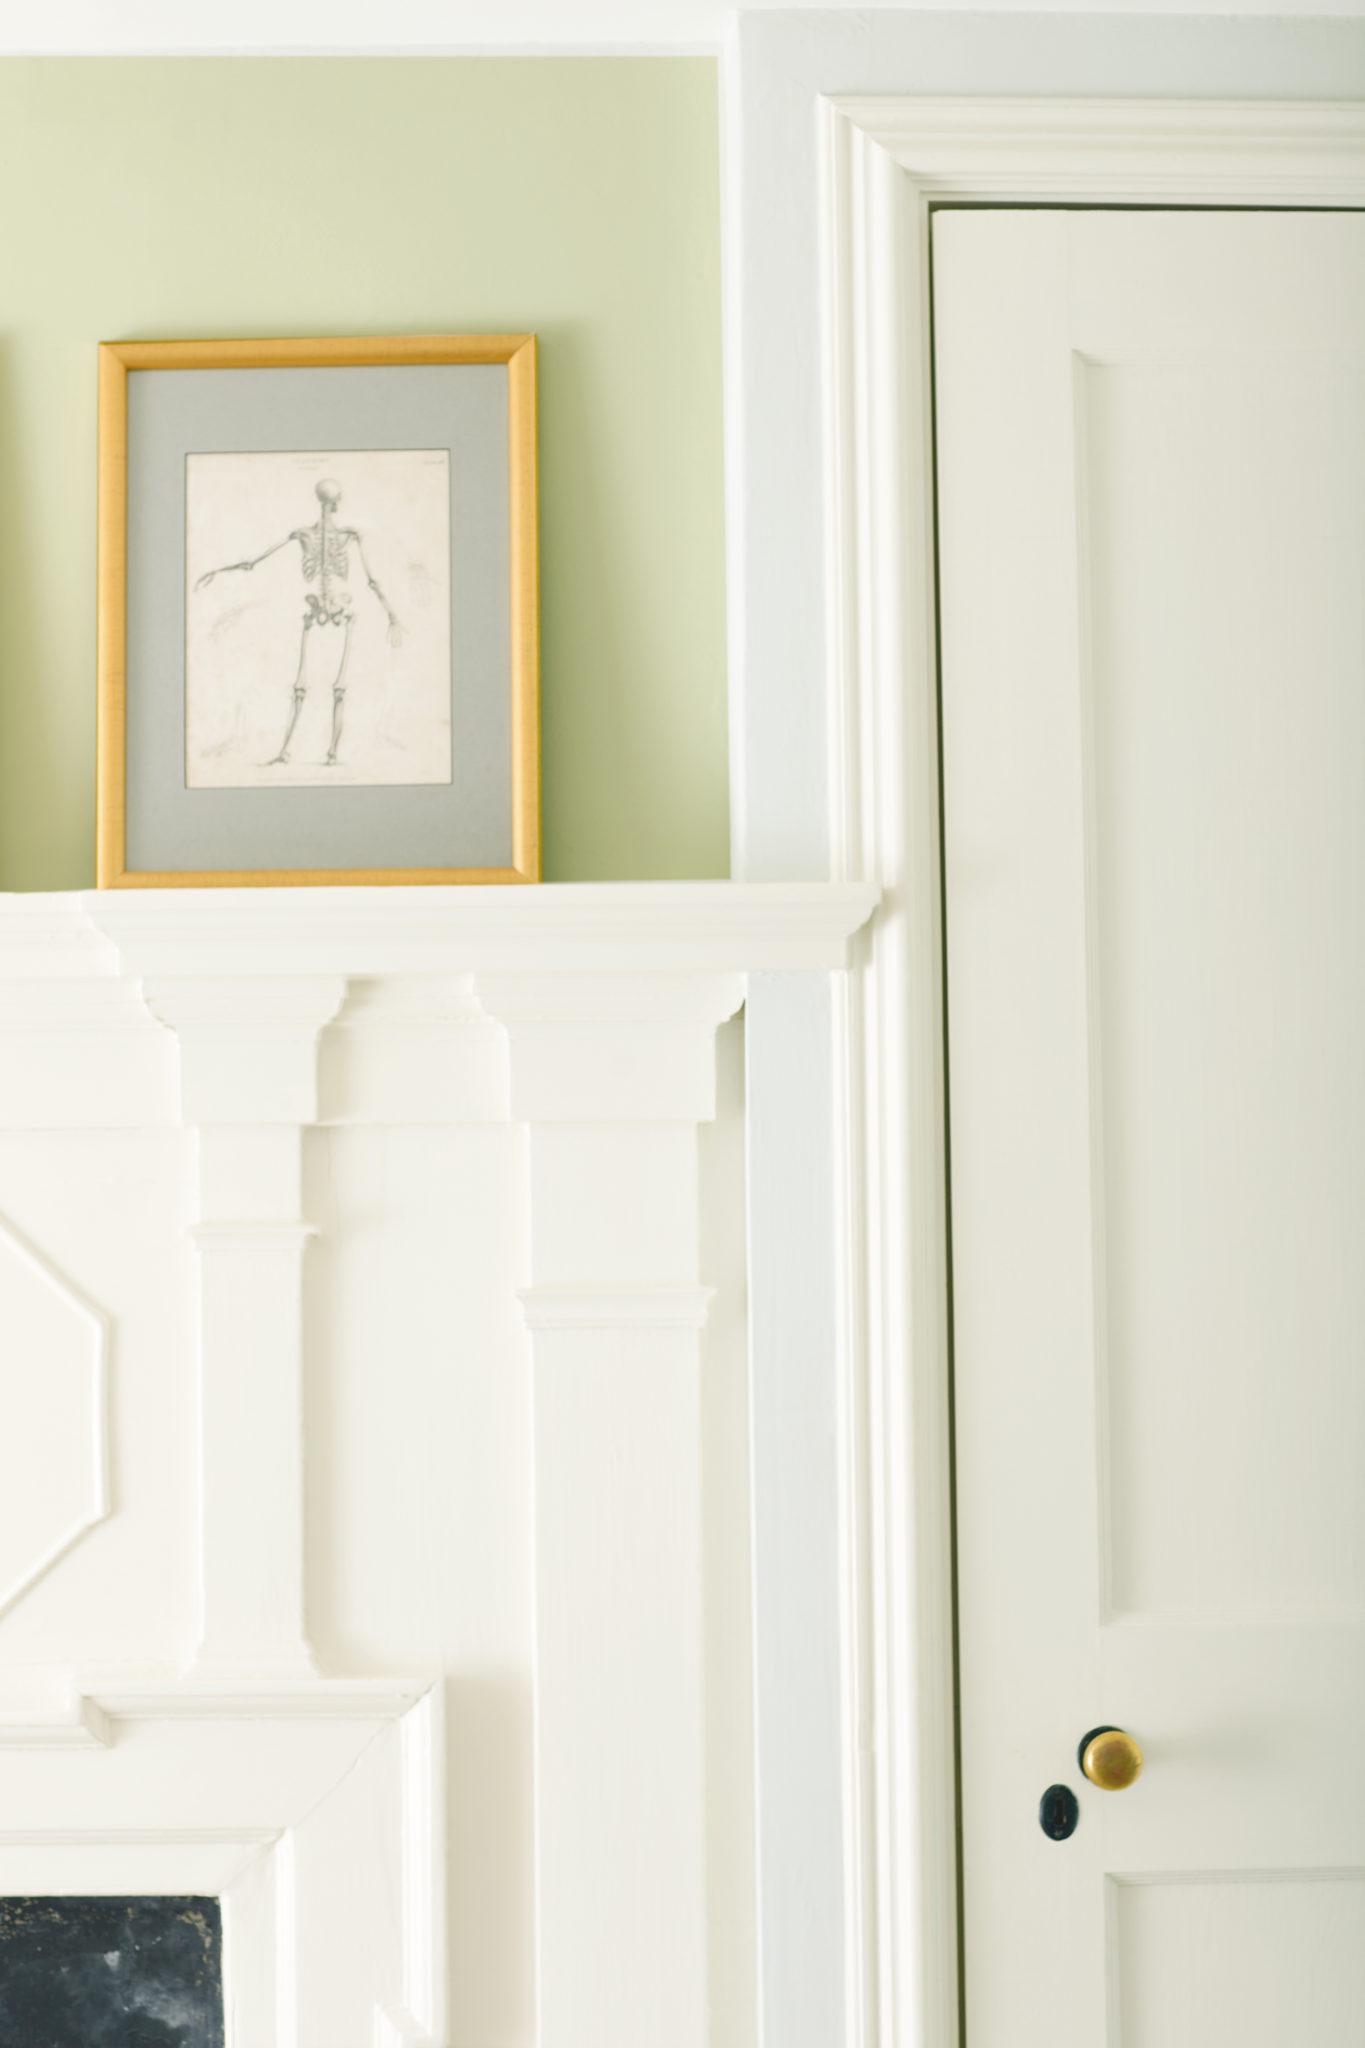 Benjamin moore regal select premium interior paint primer matte finish 548 farby i dekoracje for Benjamin moore interior paint finishes